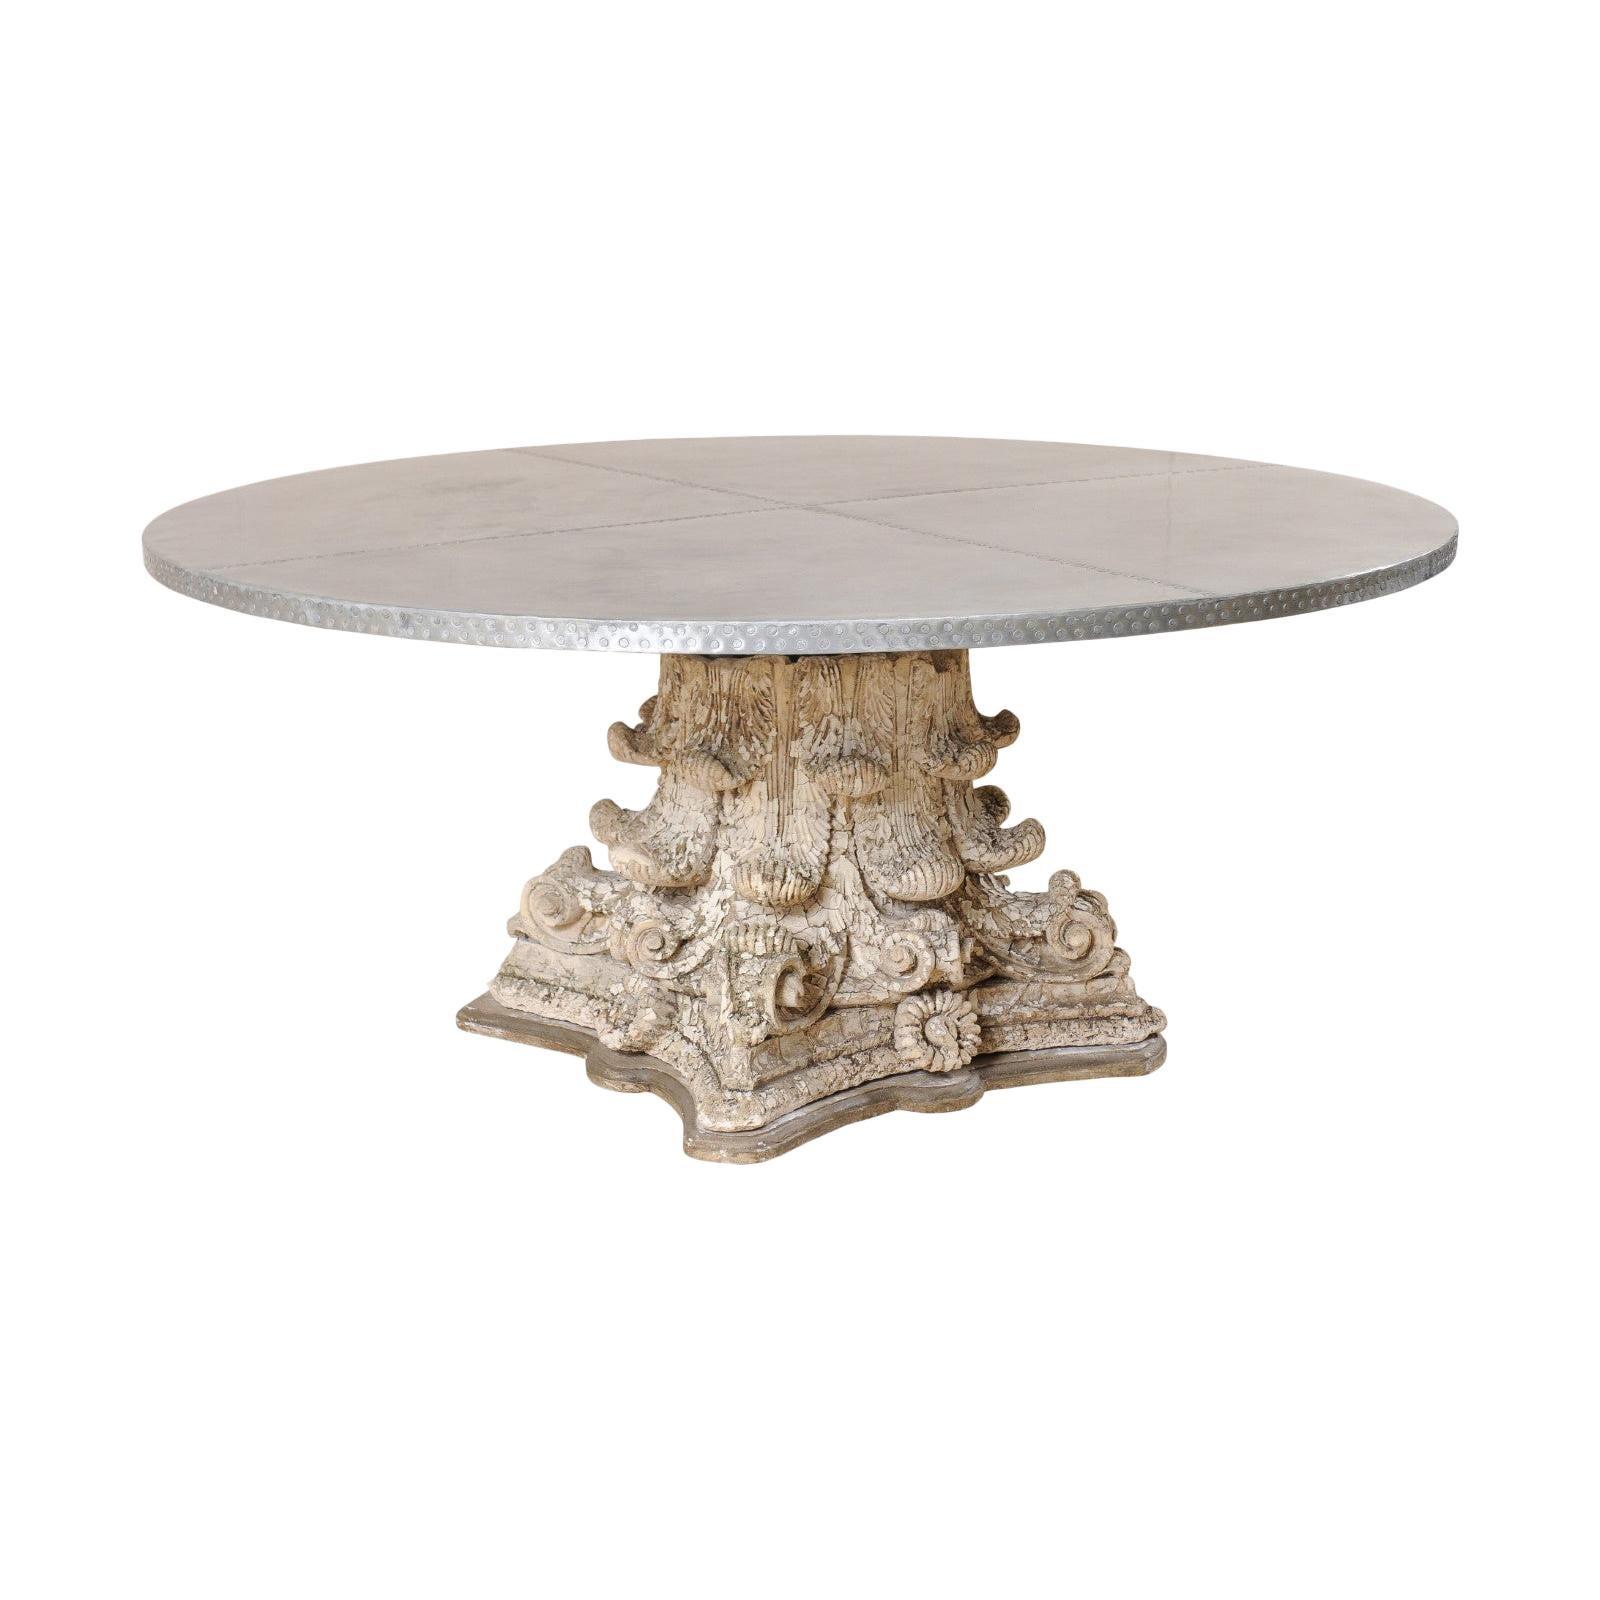 Splendid Custom Pedestal Table with Zinc Top and Early 20th Century Capital Base